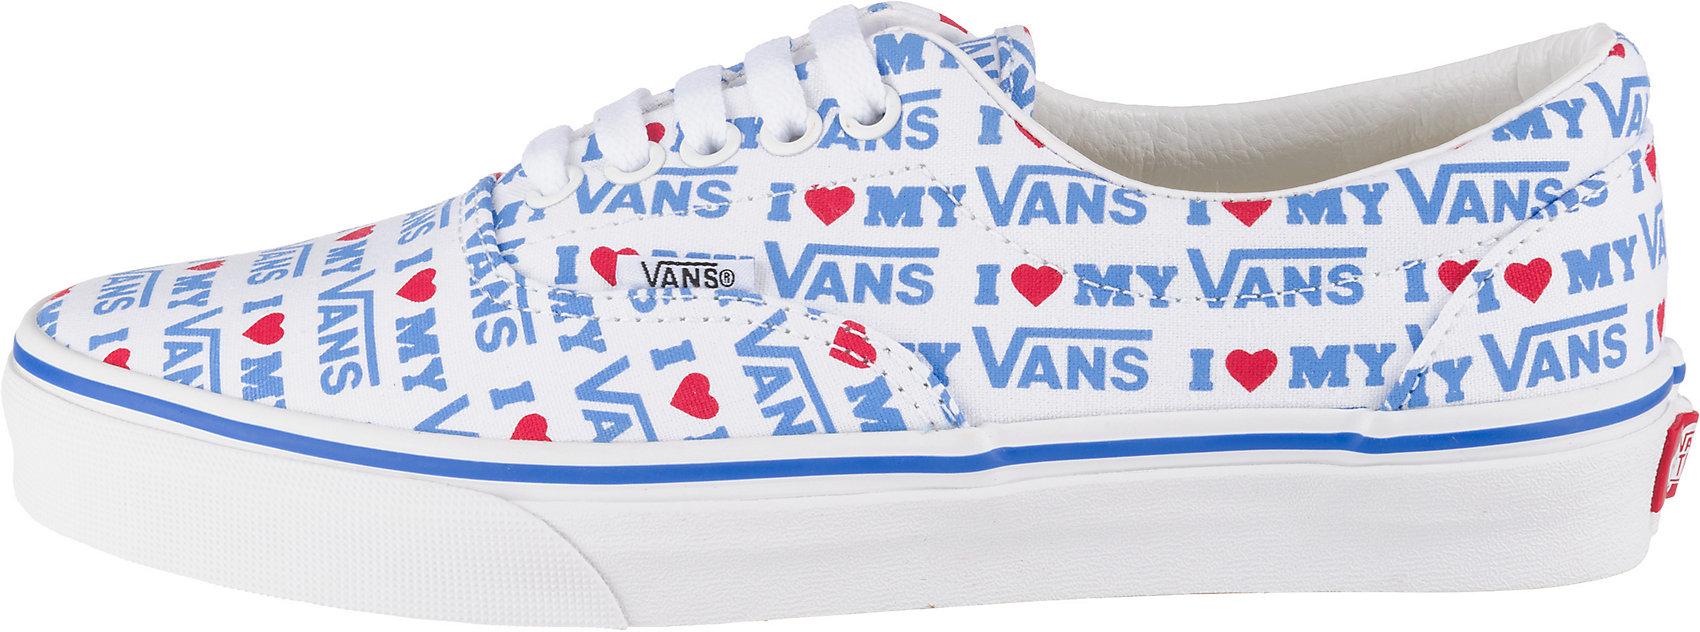 Details zu Neu VANS UA Era Sneakers Low 10648411 creme pink schwarz türkis gelb